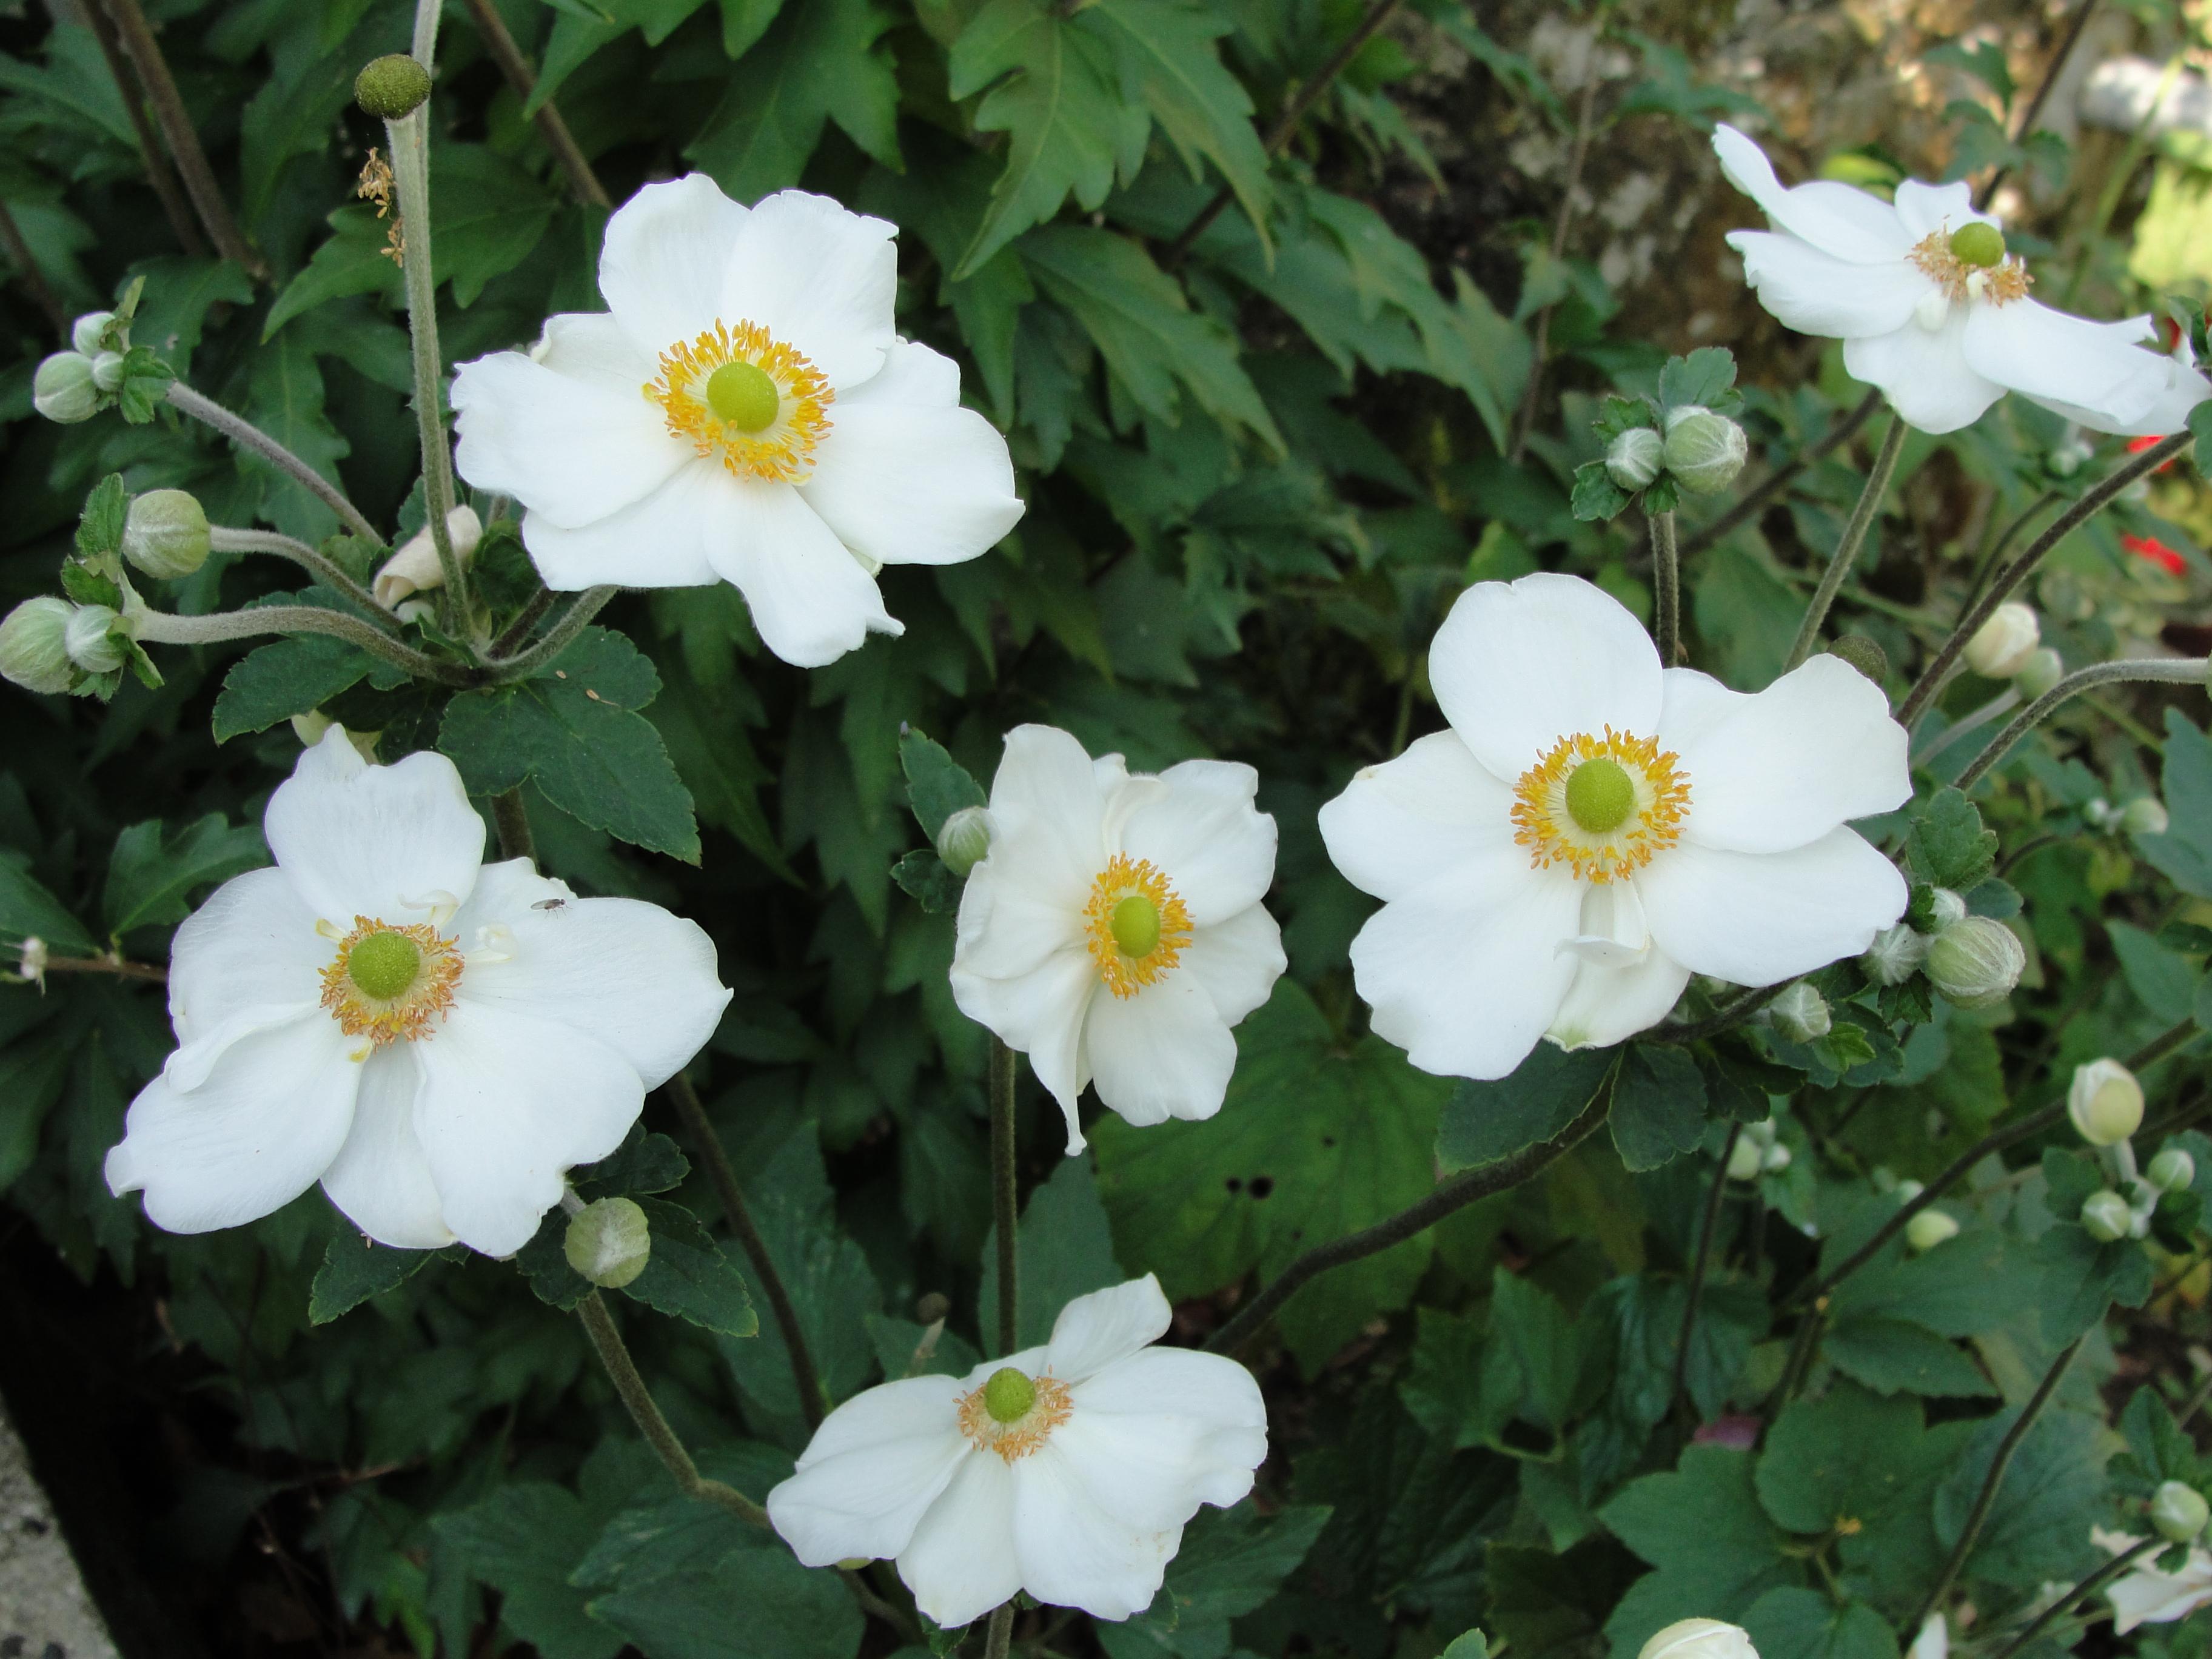 https://get.pxhere.com/photo/flower-plant-rose-family-flowering-plant-rosa-canina-evergreen-rose-rosa-wichuraiana-burnet-rose-annual-plant-shrub-anemone-rosa-rubiginosa-floribunda-carolina-rose-1424363.jpg